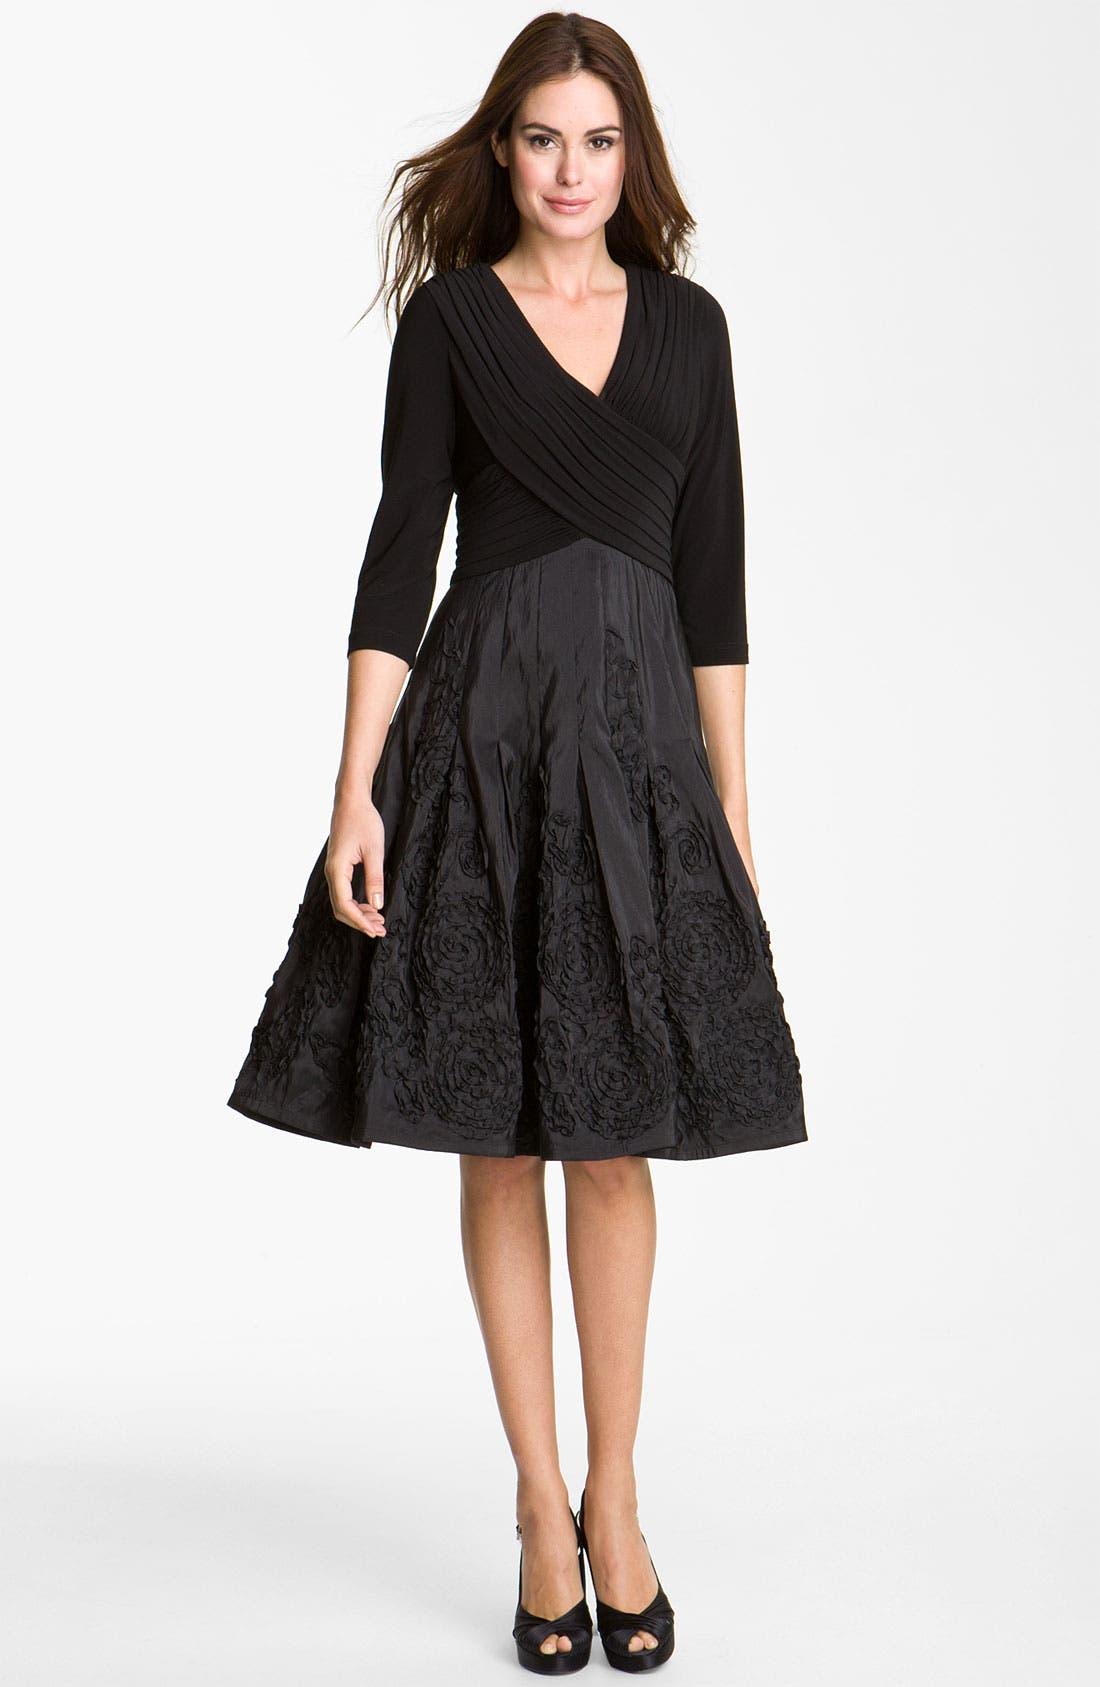 Alternate Image 1 Selected - Adrianna Papell Rosette Mixed Media Dress (Petite)